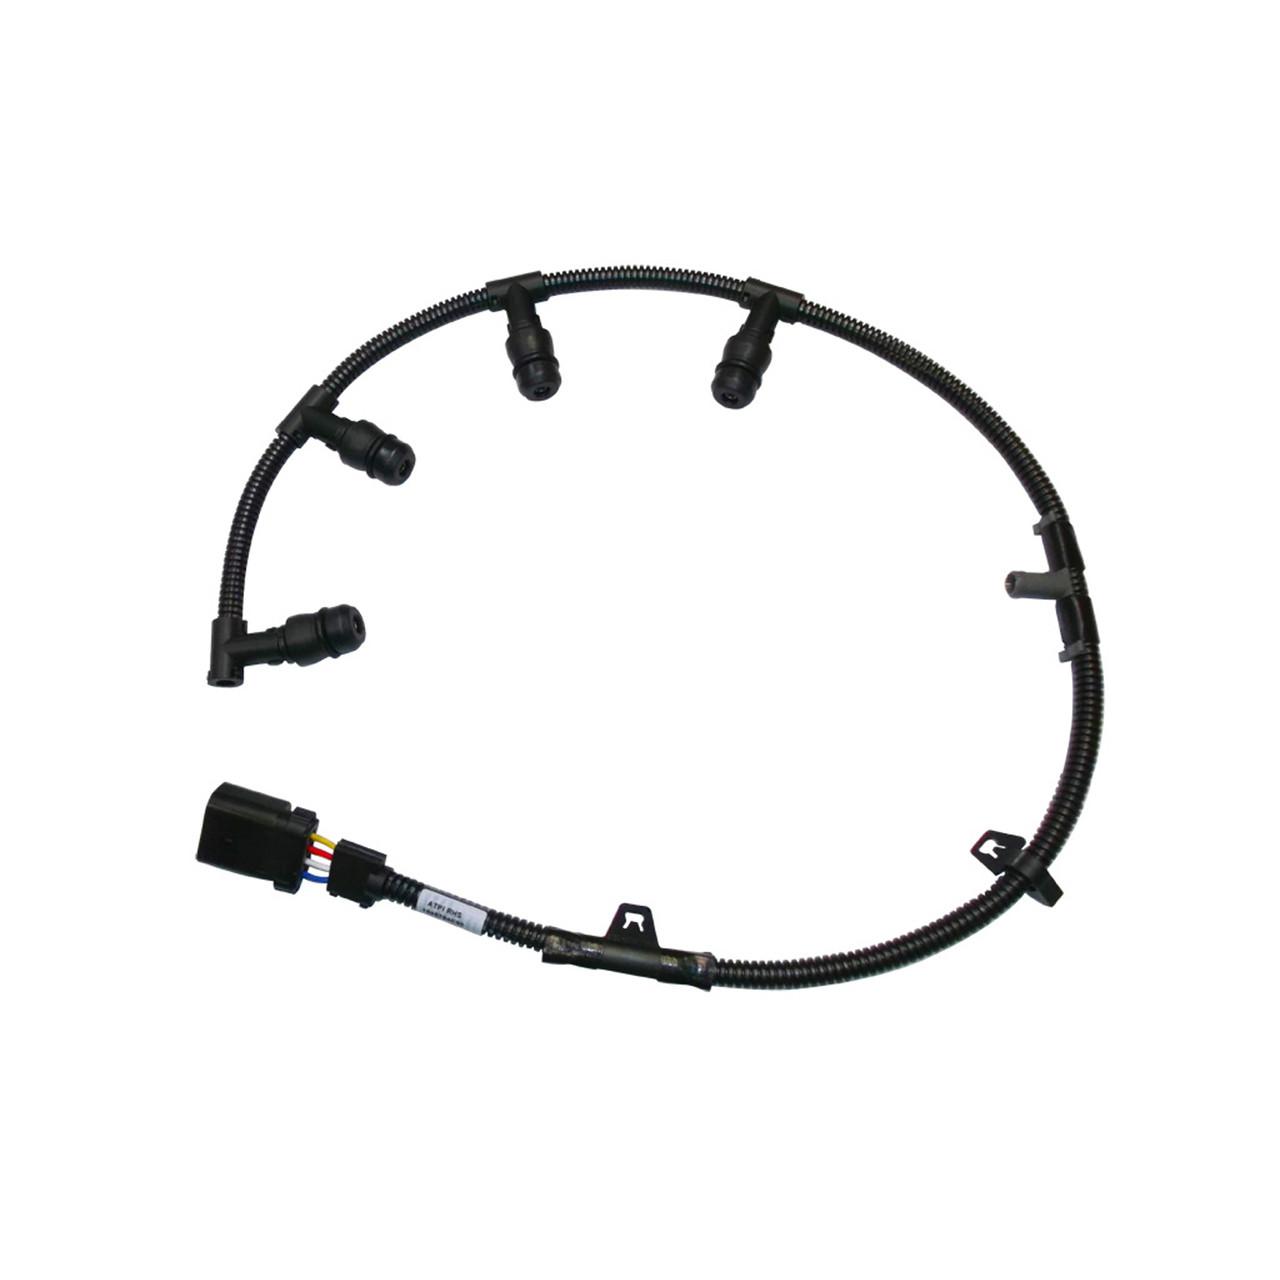 medium resolution of ford 6 0l glow plug harness passenger side wh02961 sku wh02961 upc 613111101032